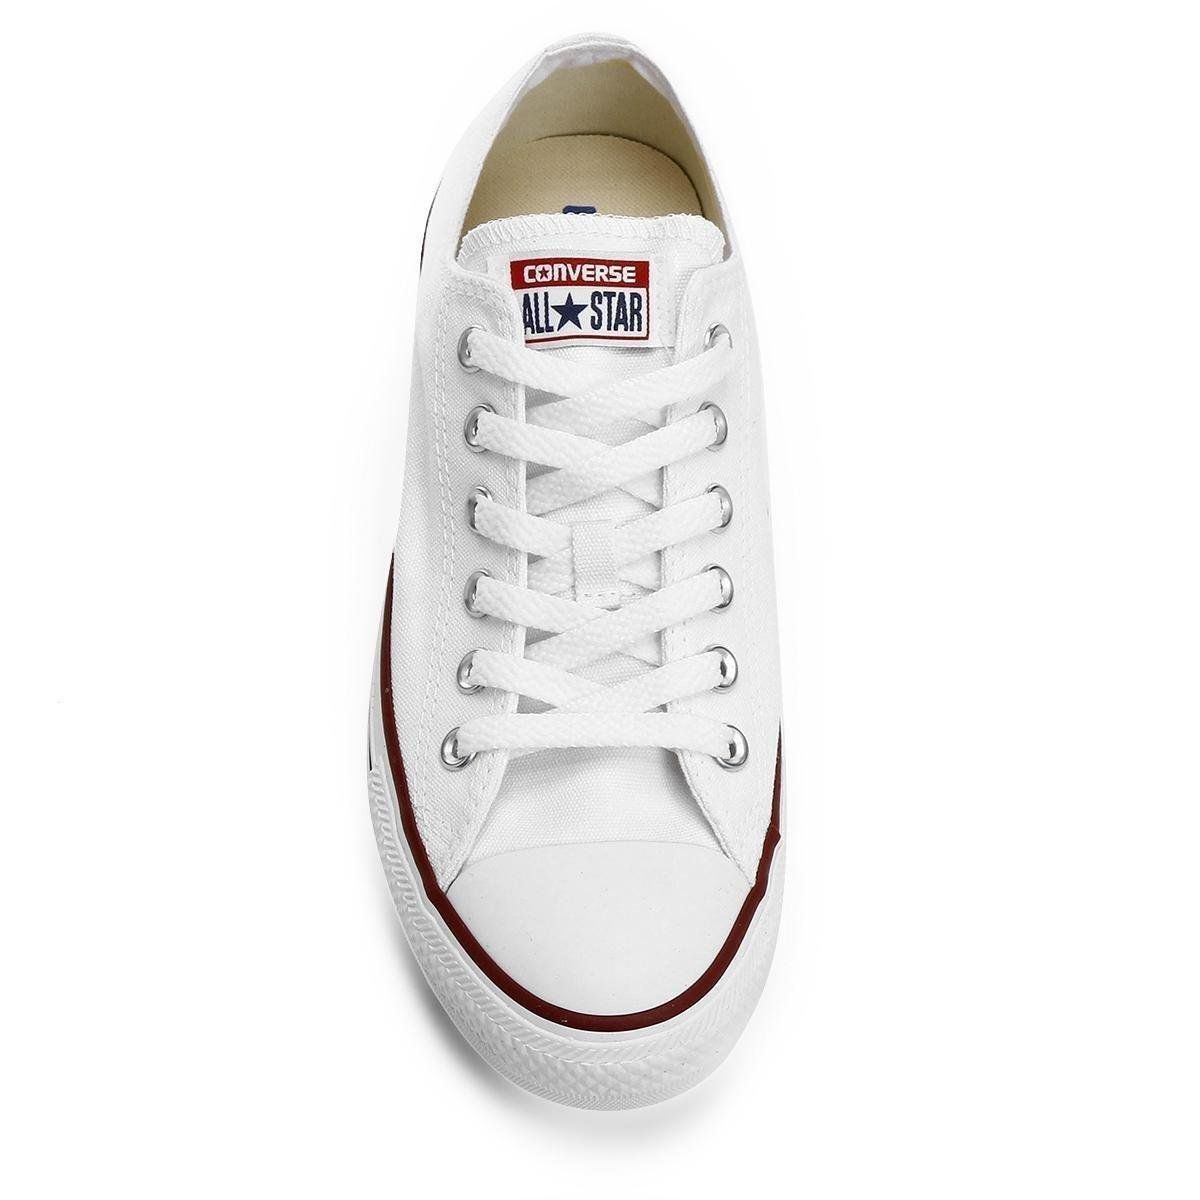 Tênis Converse All Star Ct As Core Ox - Off Branco+Vermelho